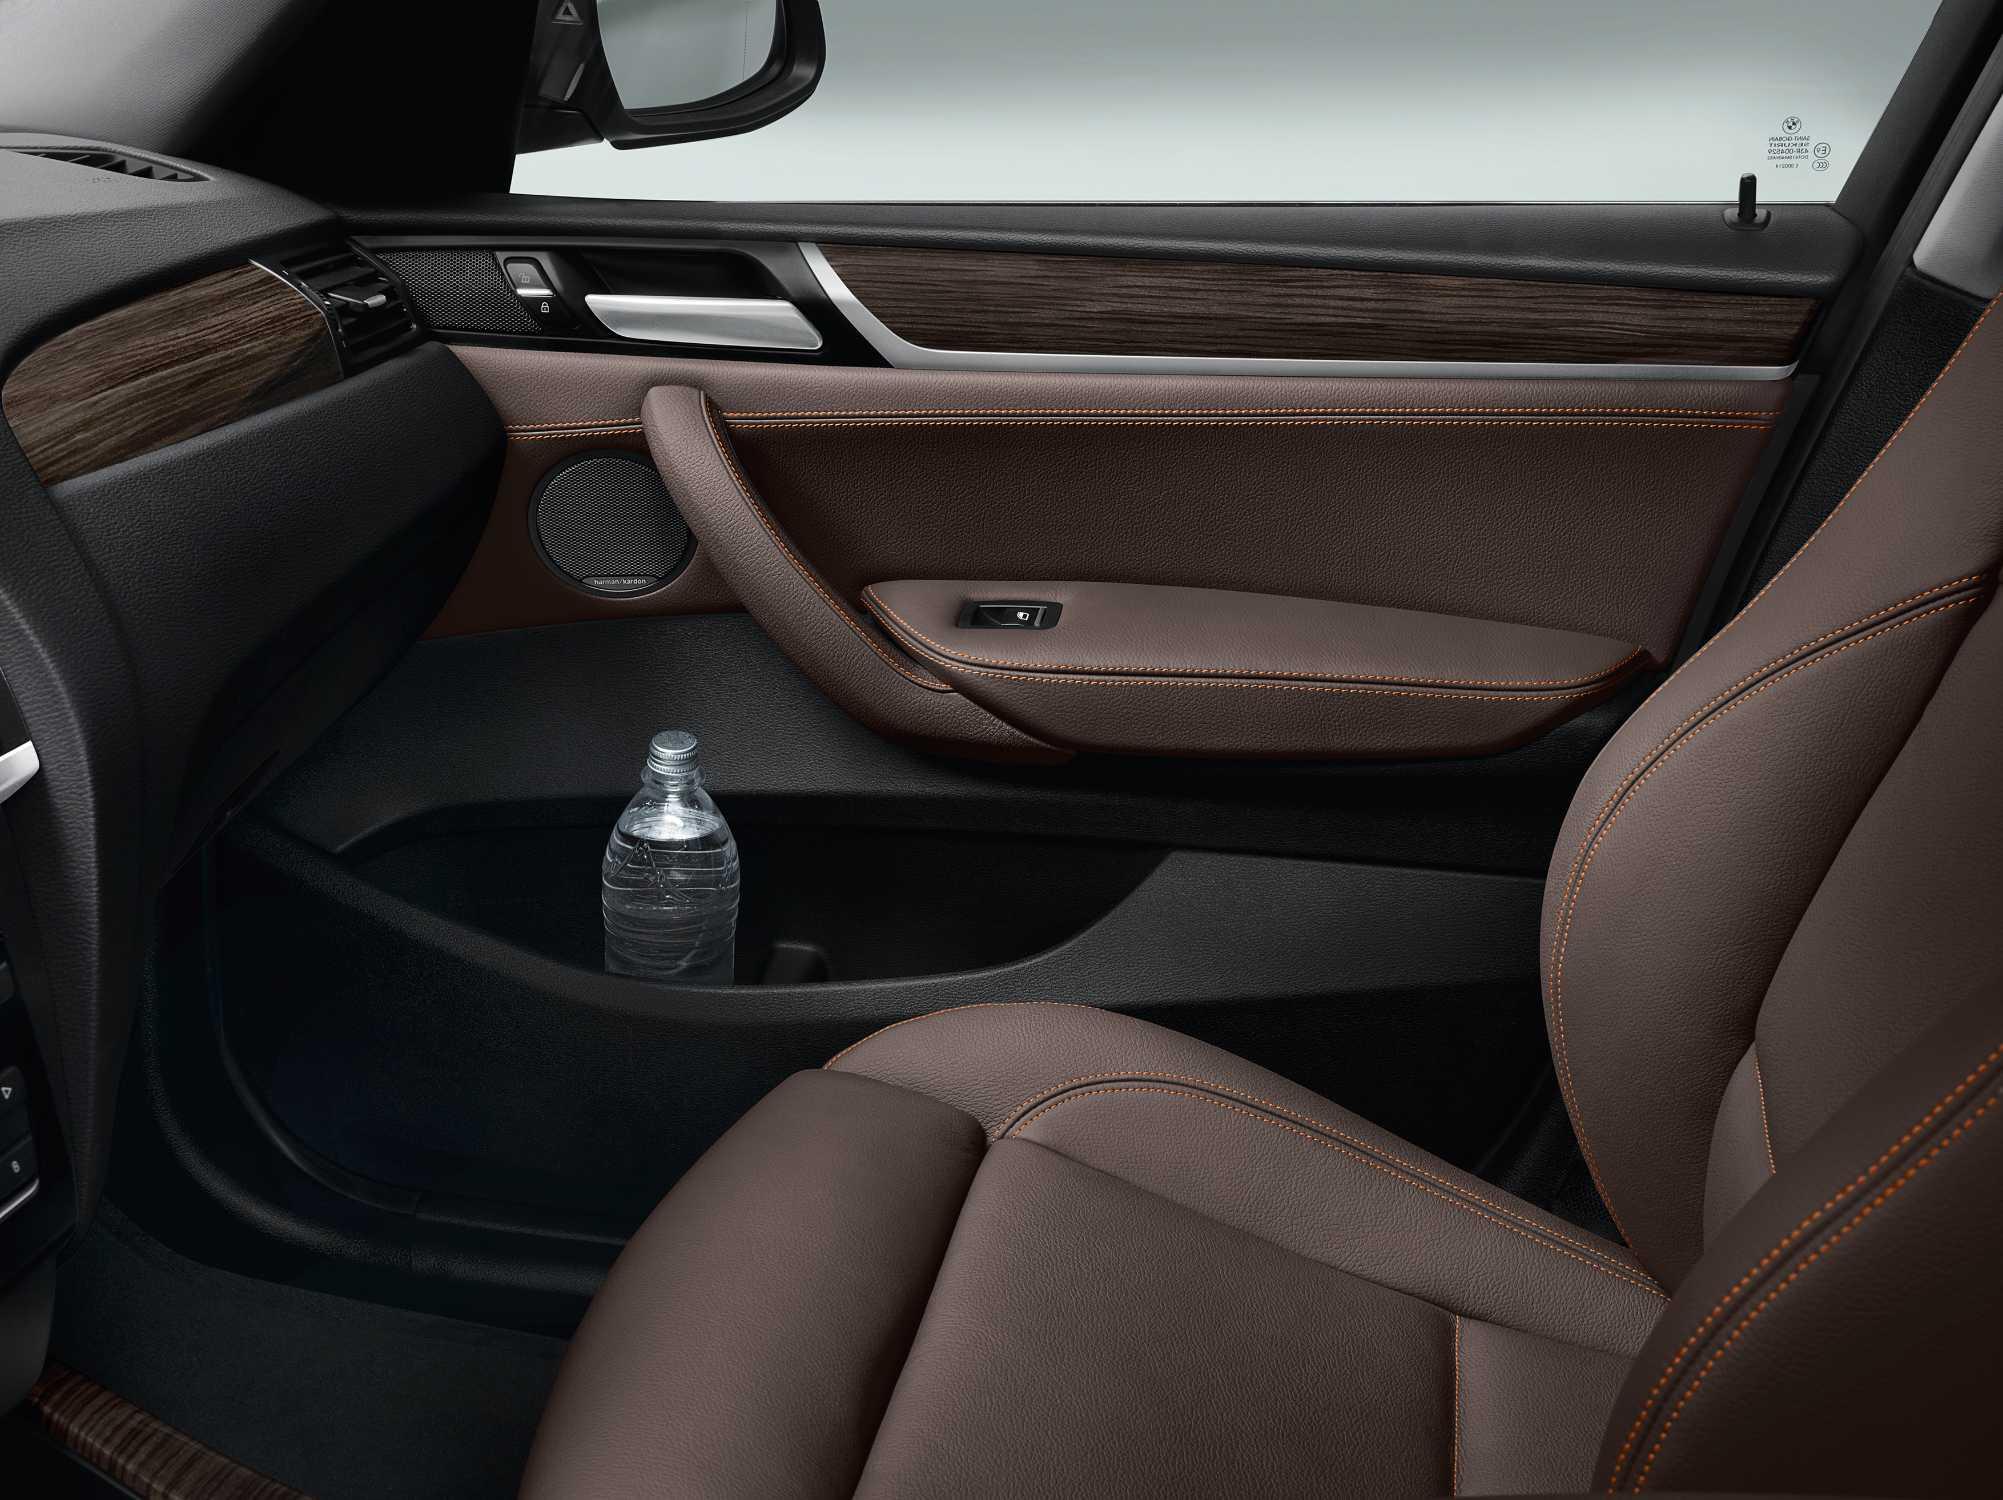 Der neue BMW X3 - Innenraum, Leder Nevada Mokka - Interieurleiste ...